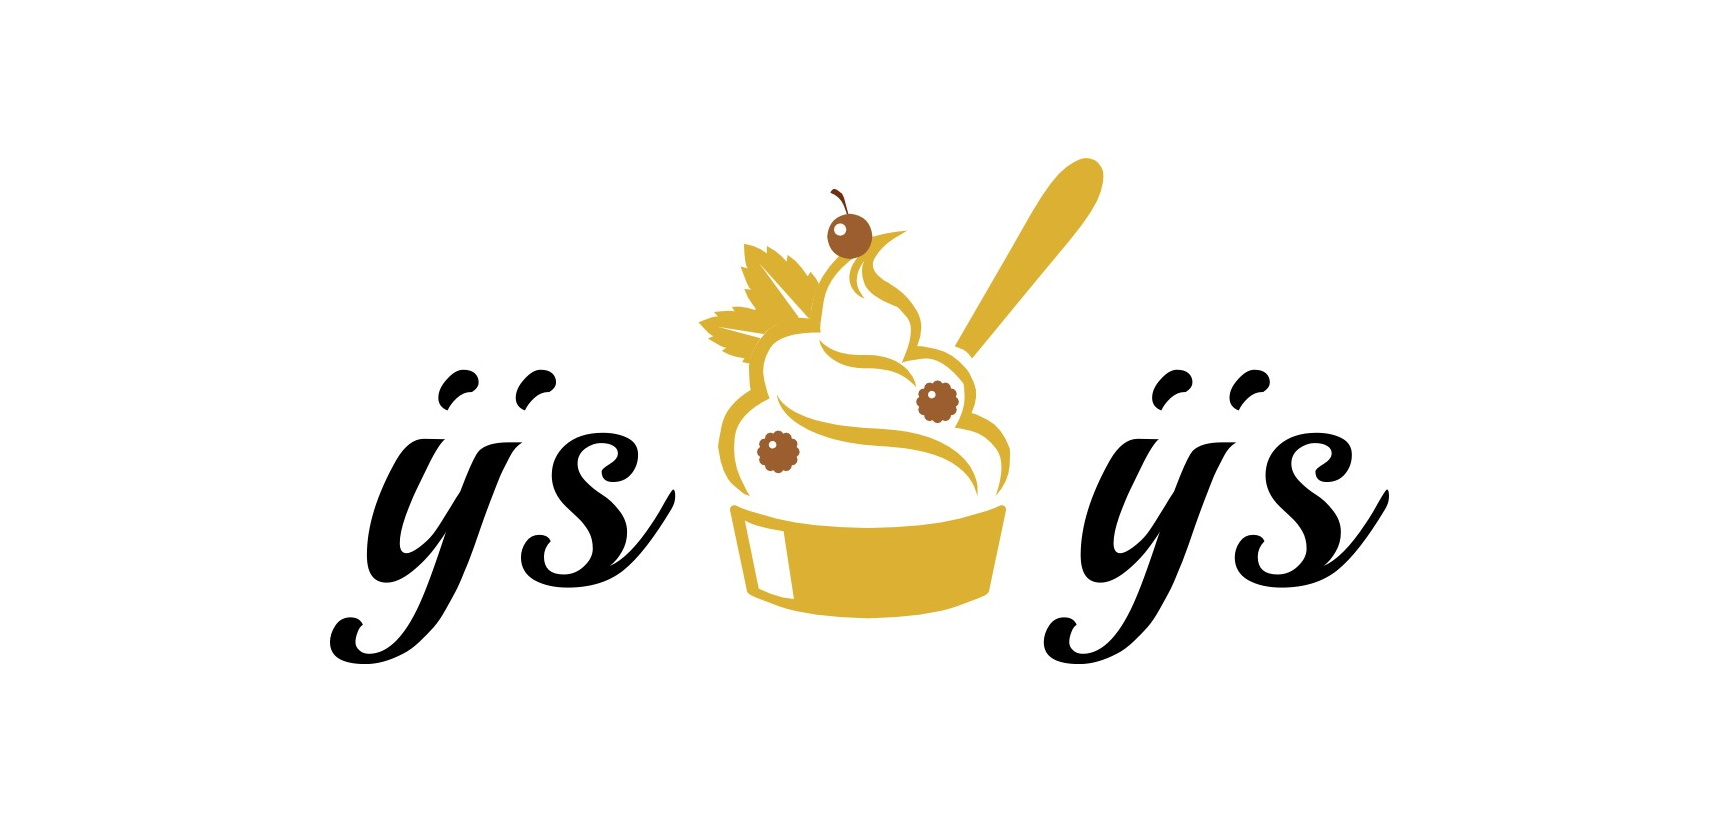 ijsijs logo